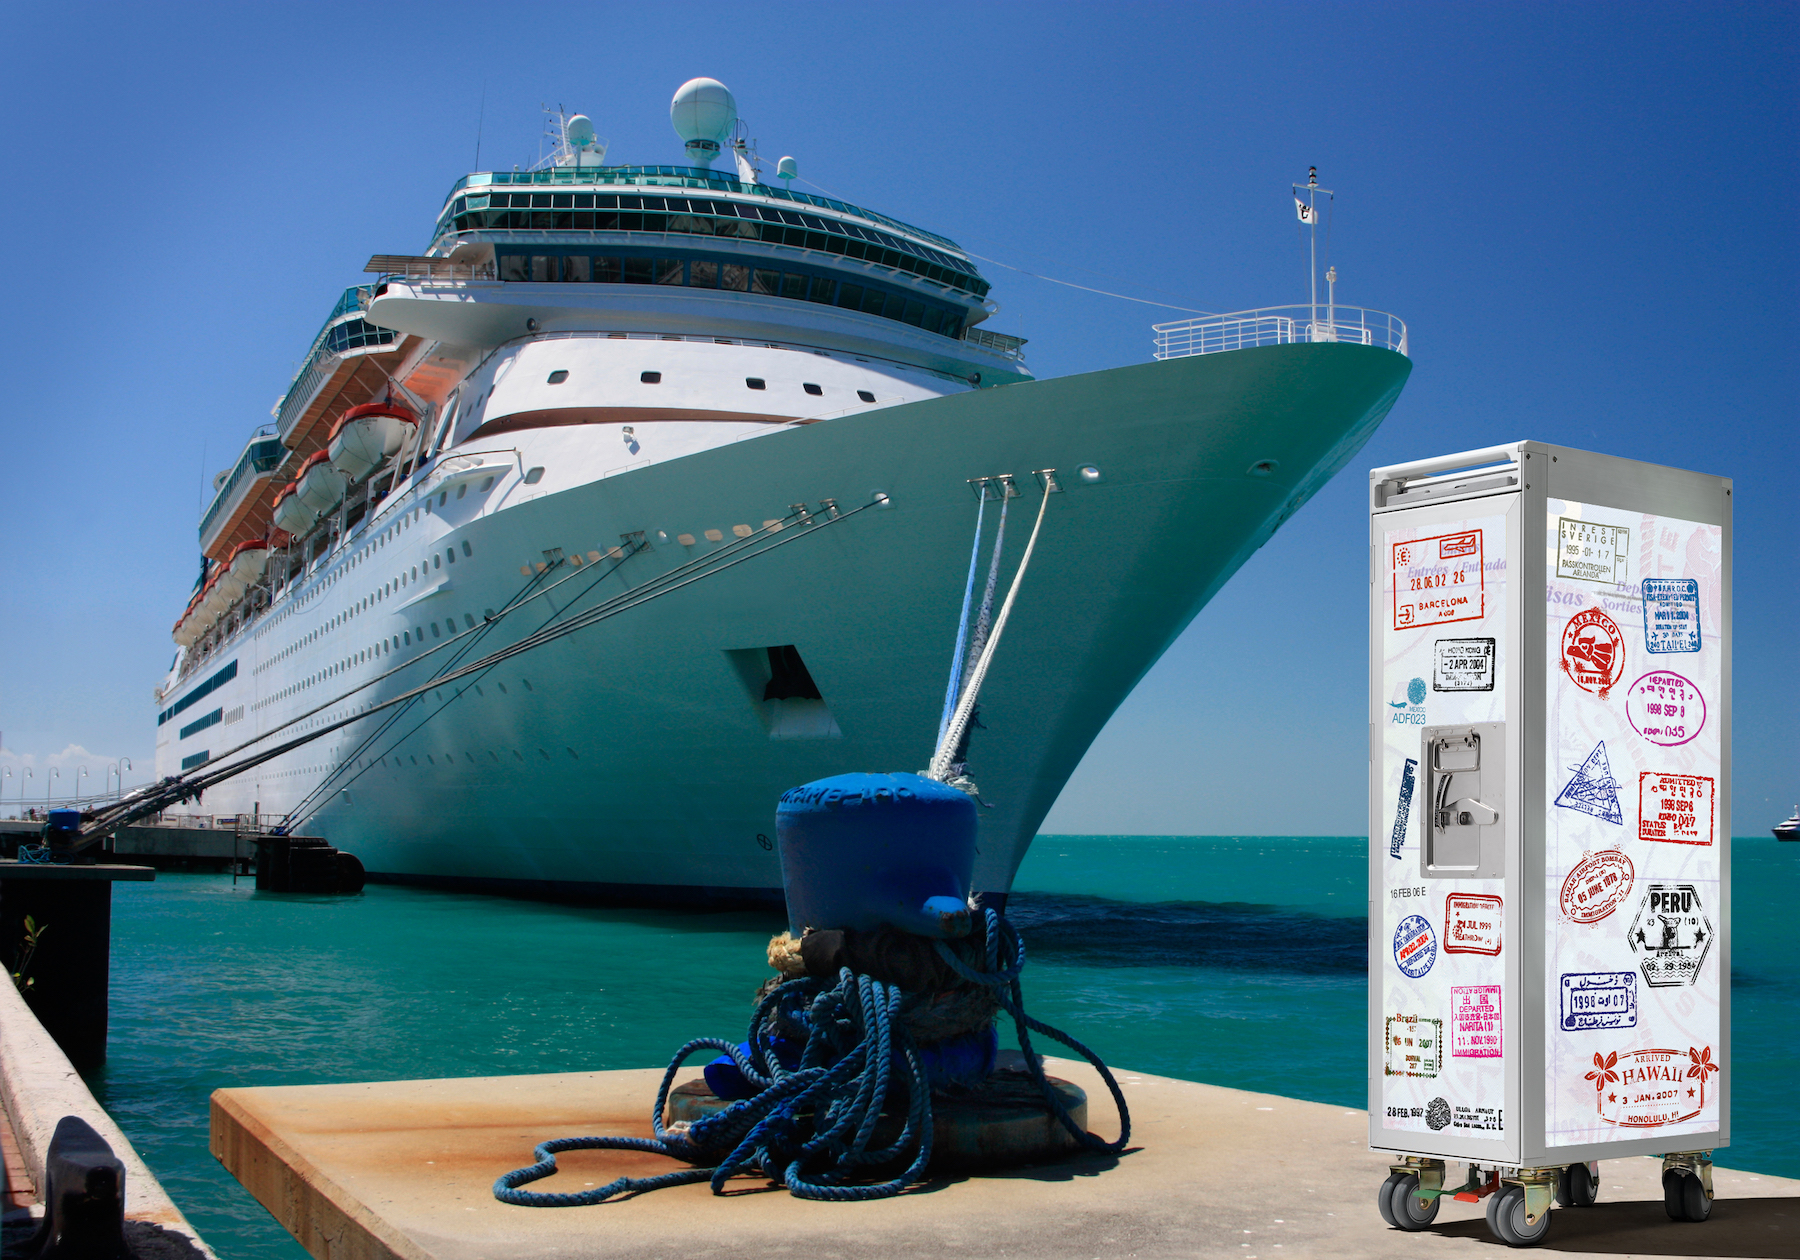 skypak-passport-vacation-wine_bar-trolley-ship-yachting